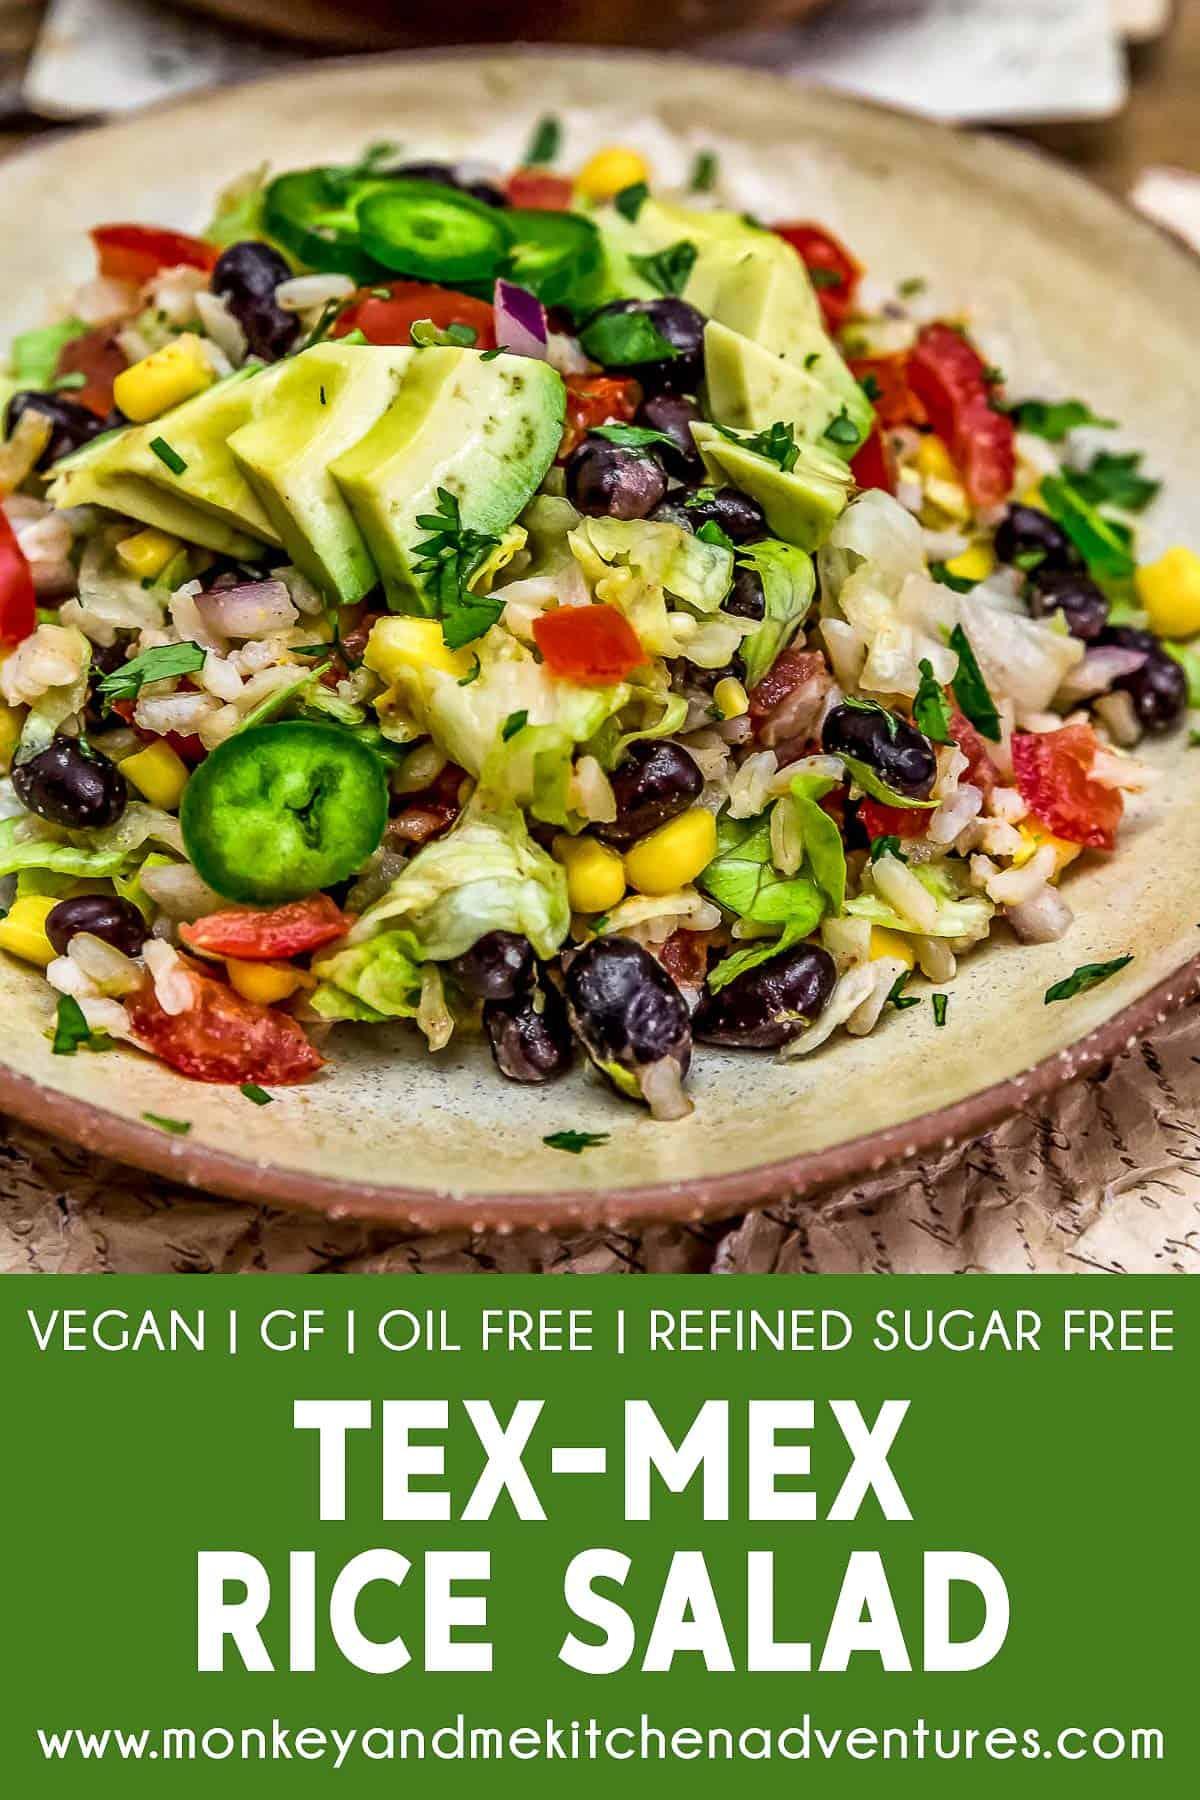 Tex-Mex Rice Salad with Text Description